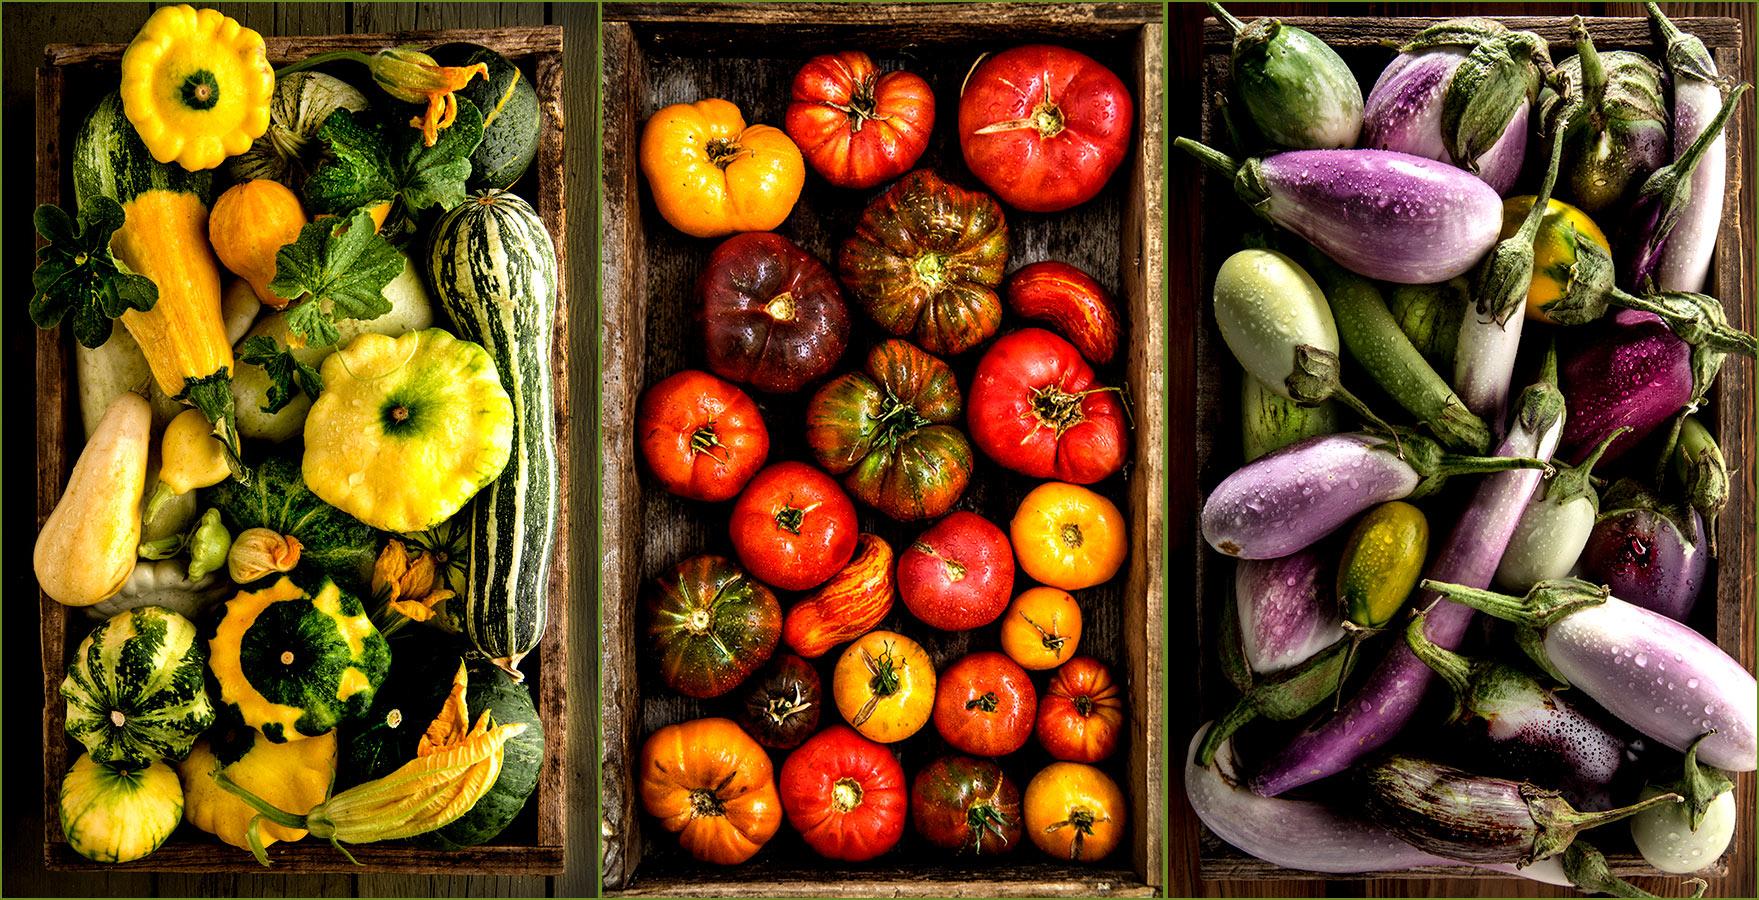 Squash-Tomatoes-Eggplants-Carl-Kravats-Photography